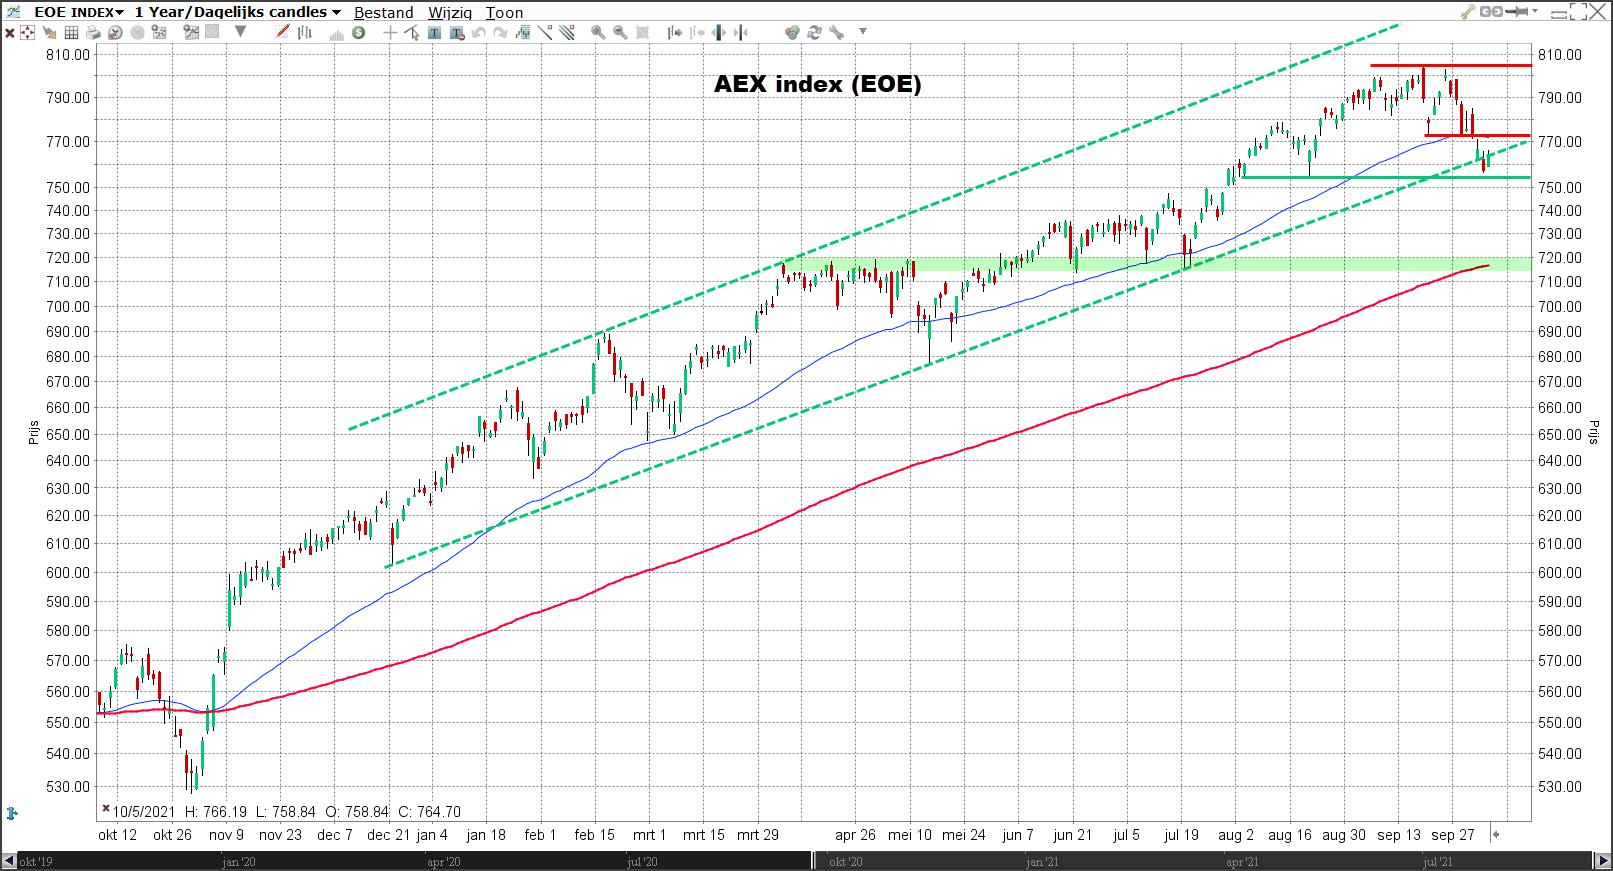 Korte termijn analyse AEX index (EOE): daggrafiek